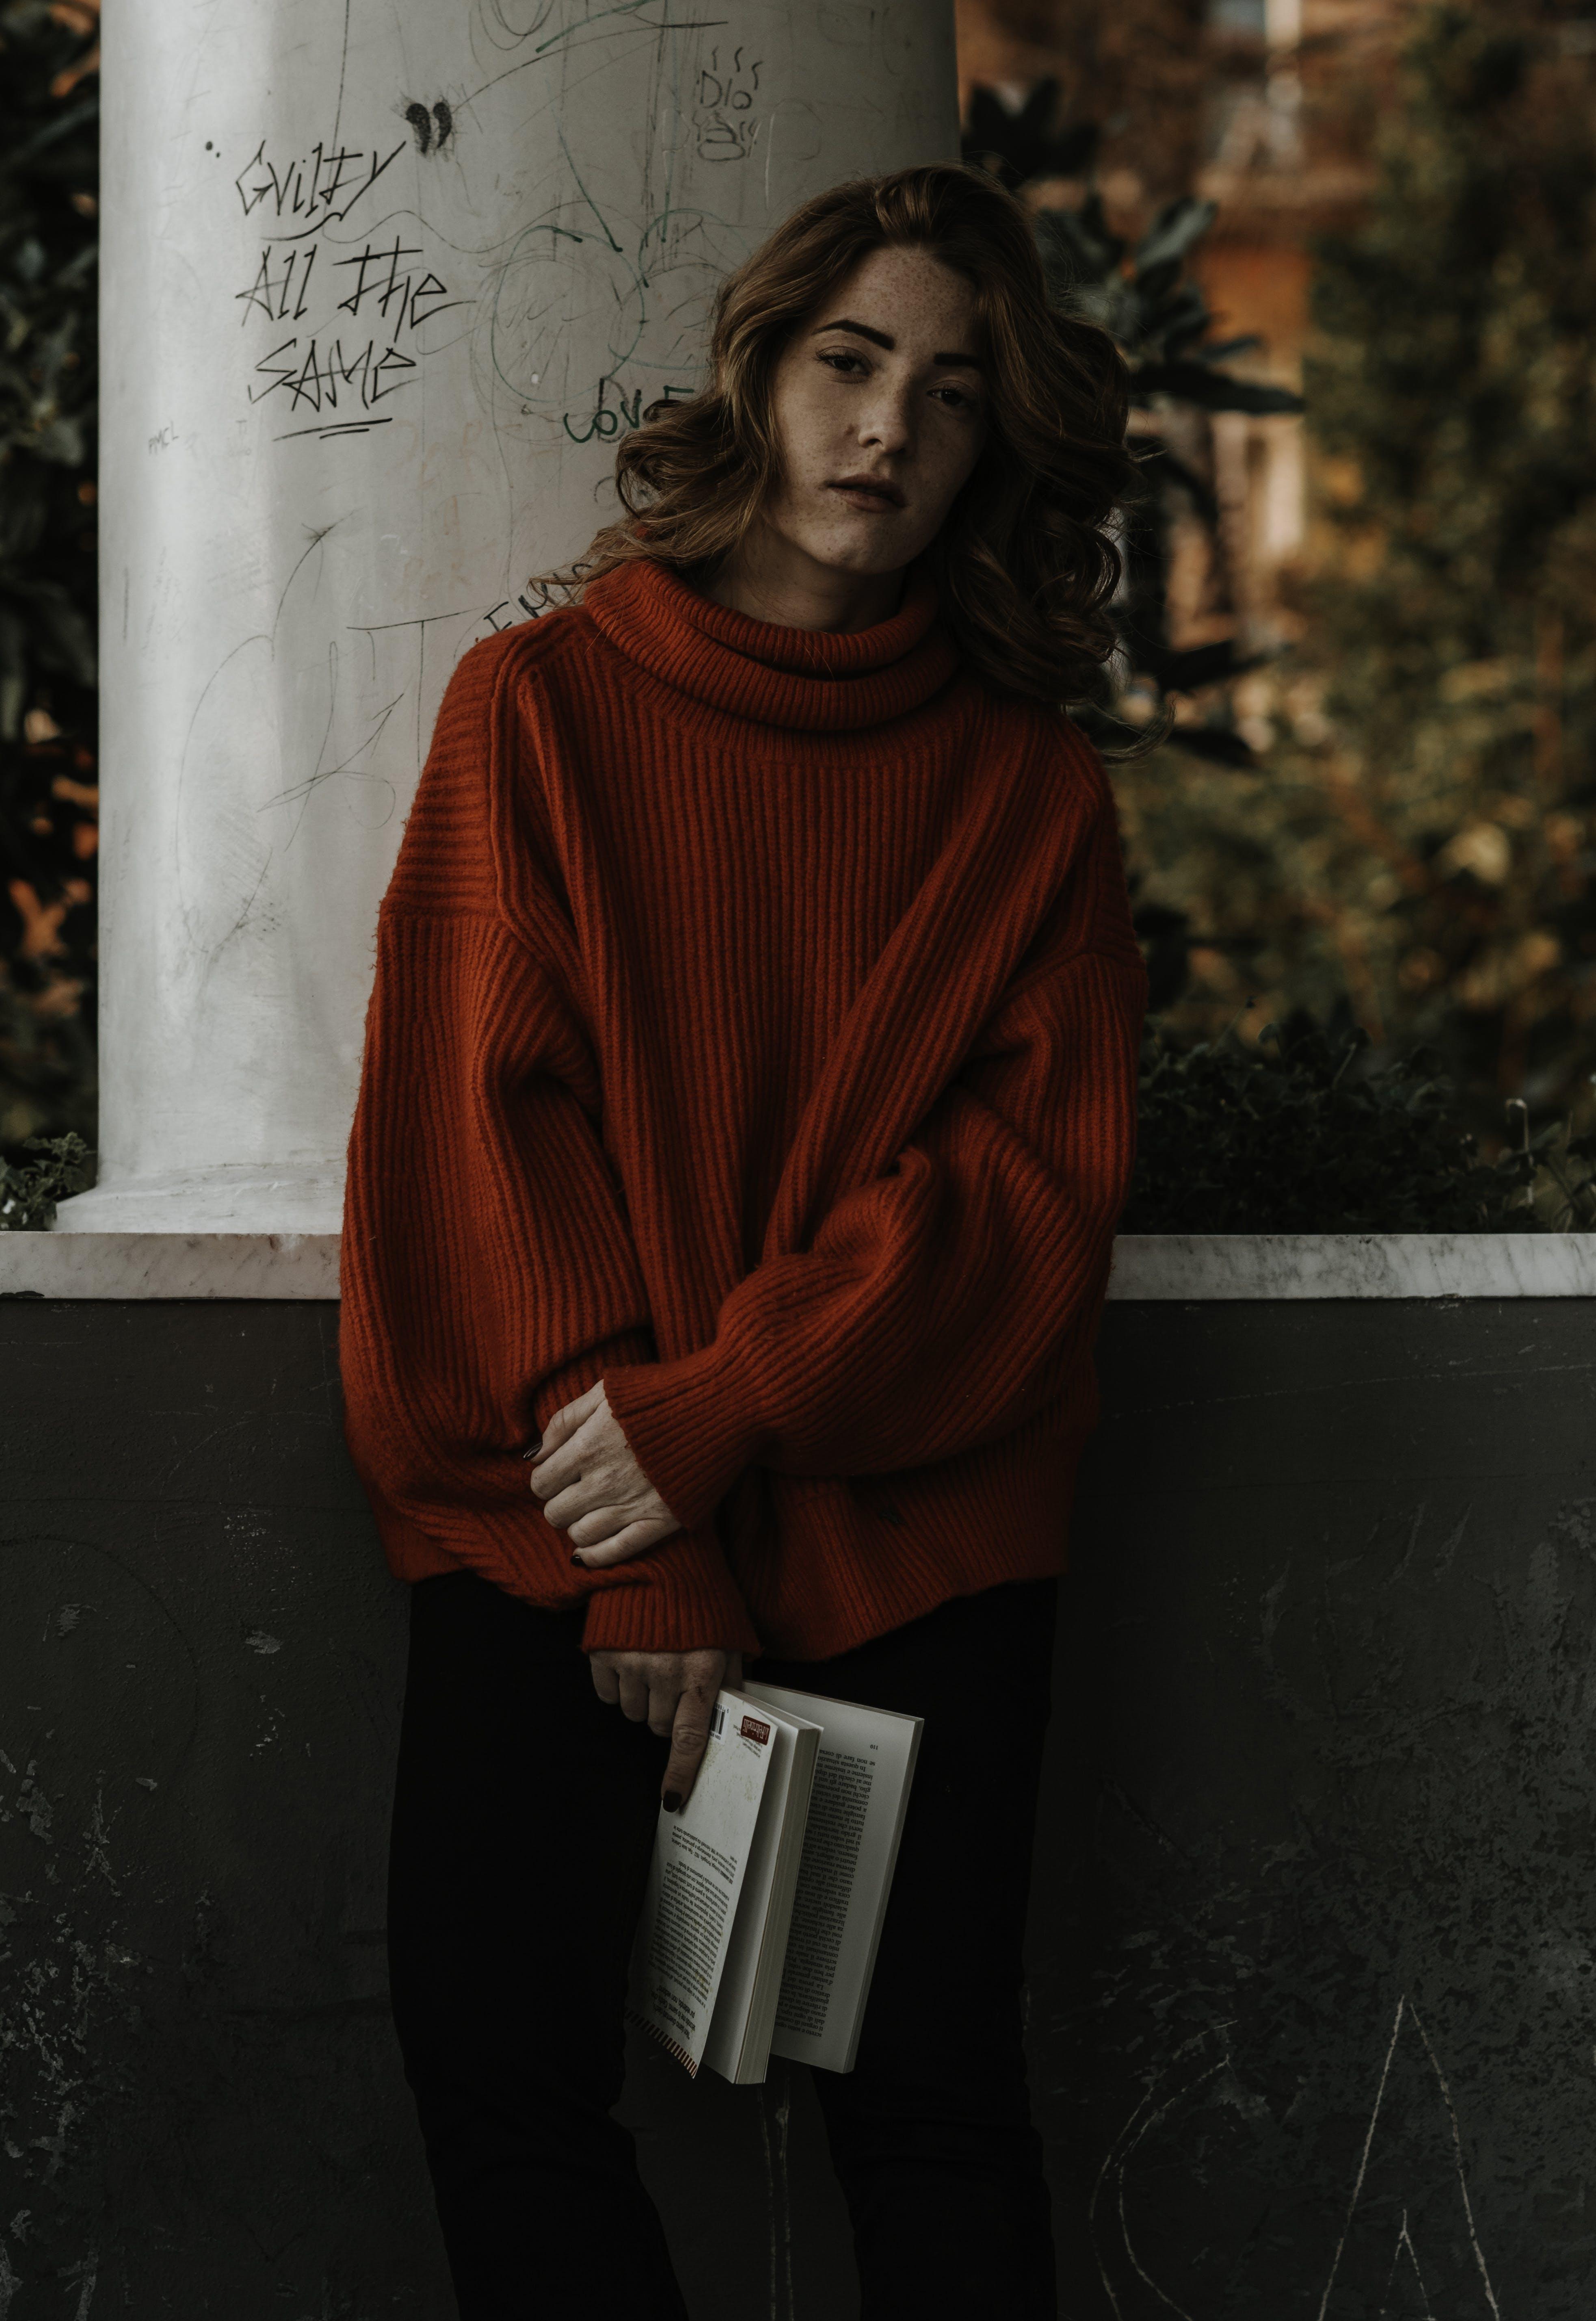 Gratis stockfoto met bovenkleding, dame, fashion, fotomodel